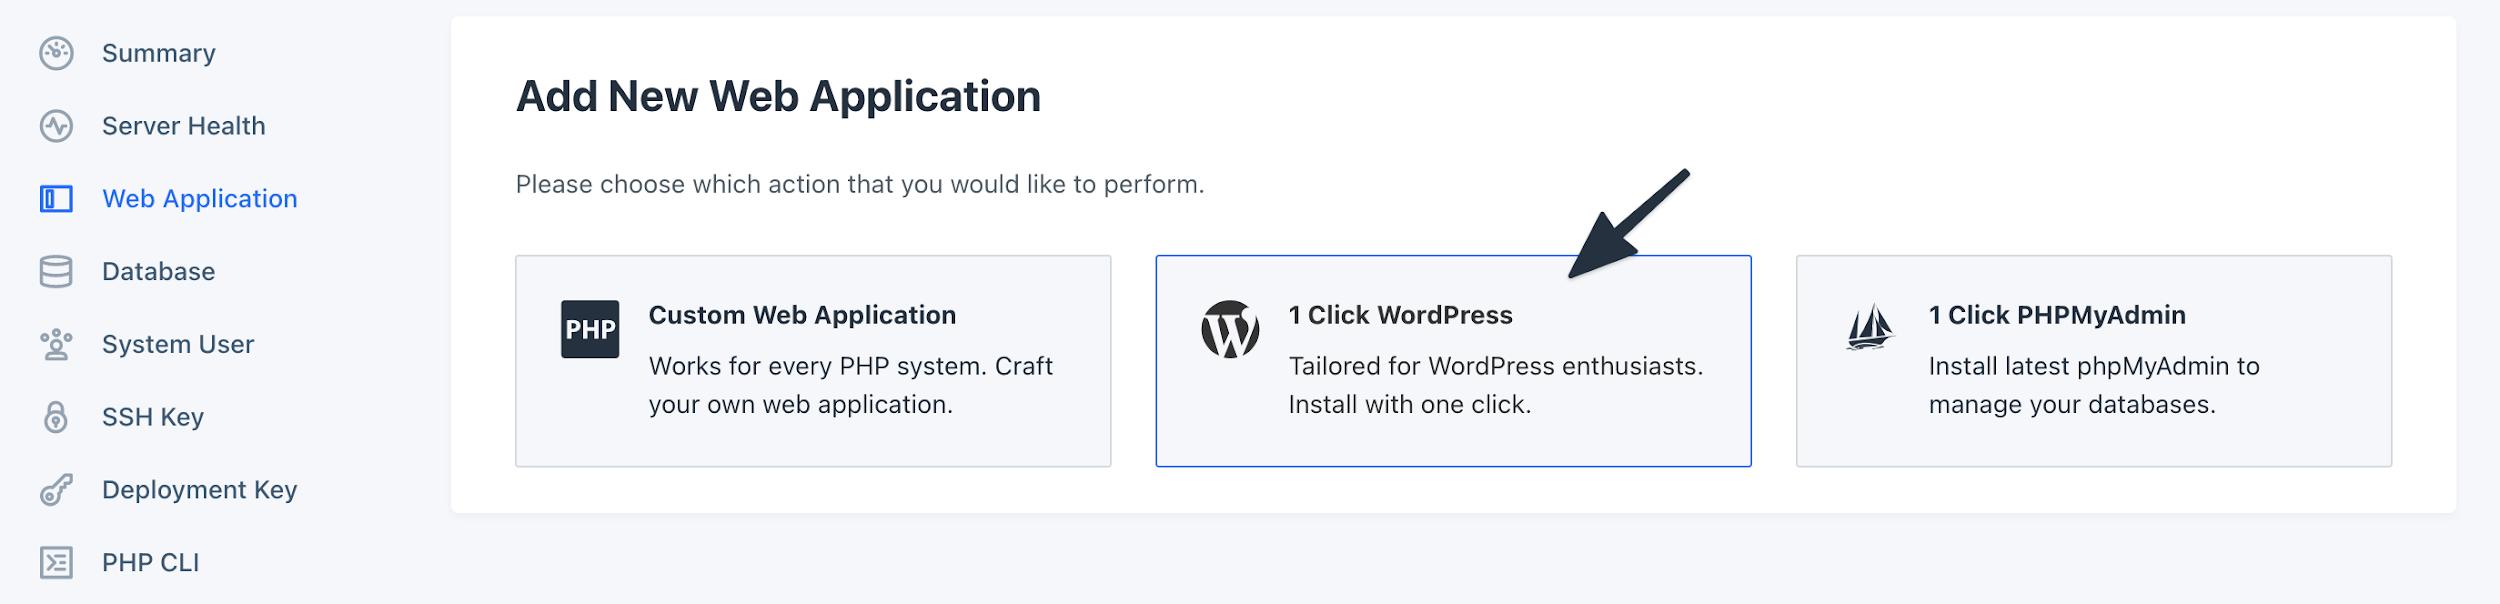 1-Click WordPress Installation